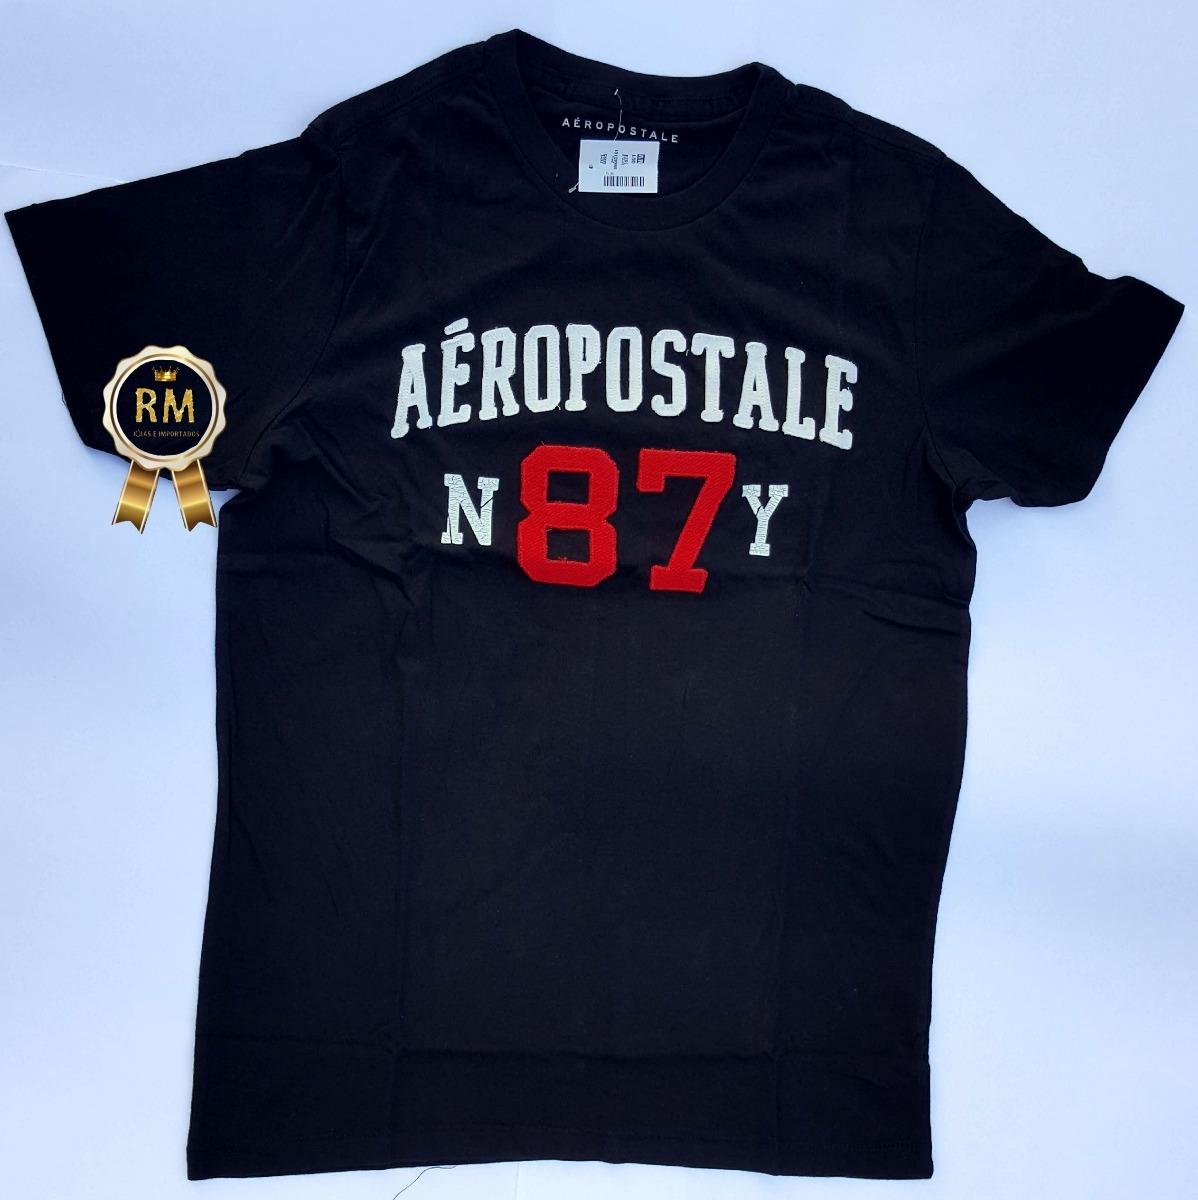 2d70995cc6a3d blusas camiseta camisa aeropostale original pronta entrega. Carregando zoom.